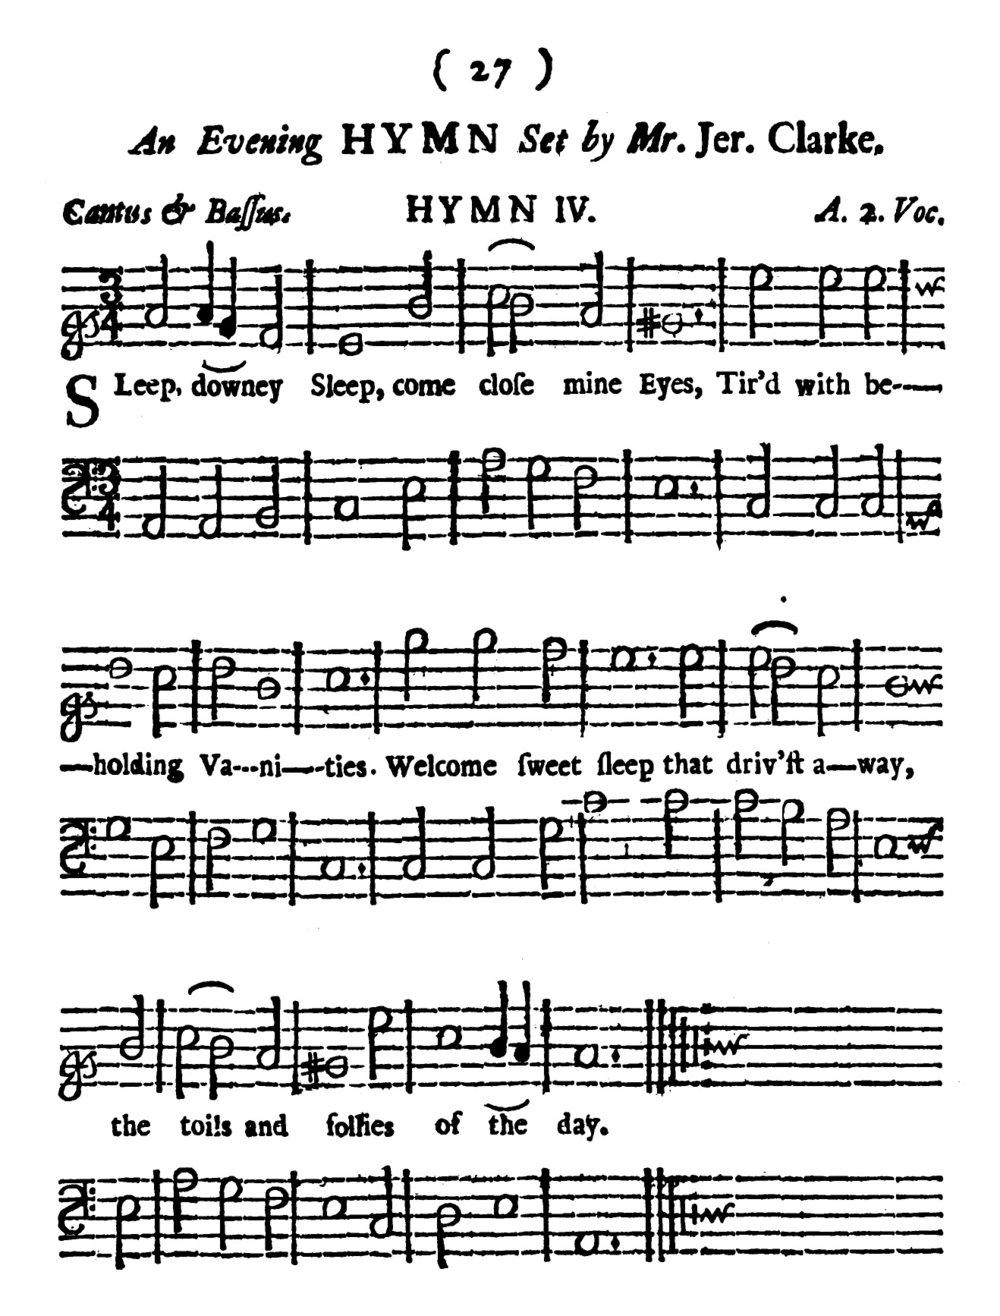 Fig. 4.  Henry Playford,  The Divine Companion  (London, 1701).